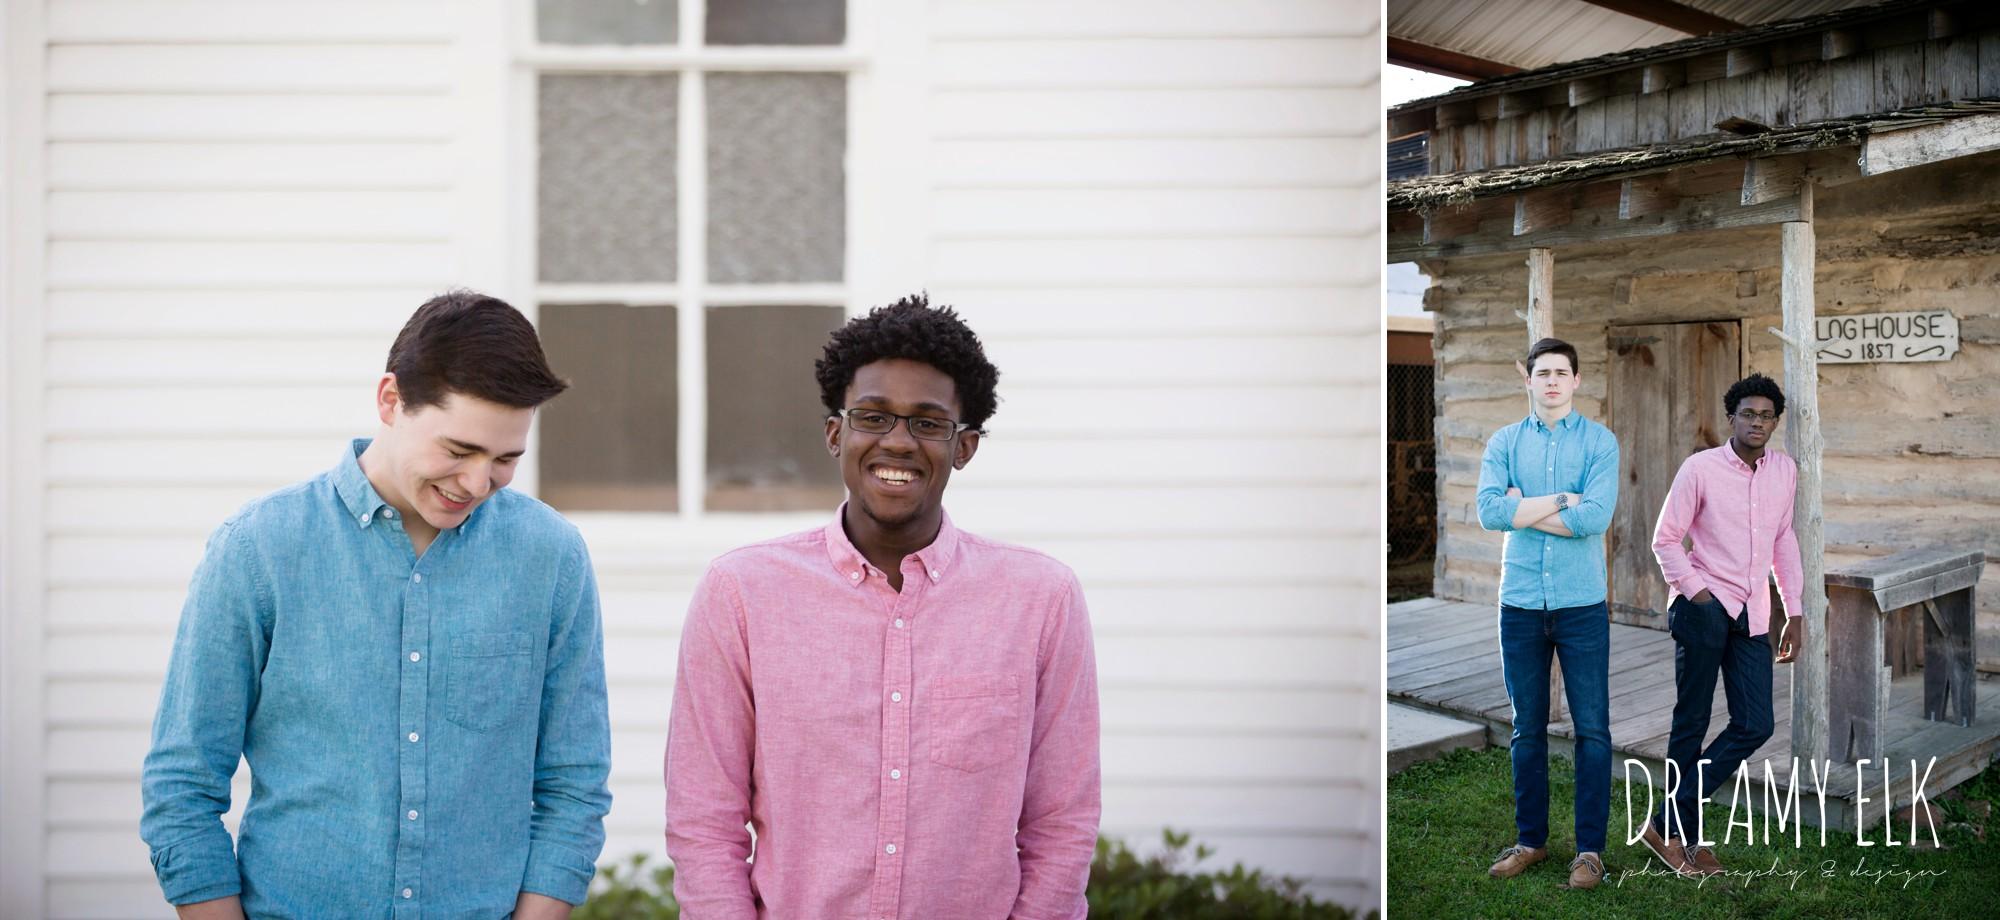 spring, march, high school senior boy, best friends, senior photo, tomball, texas {dreamy elk photography and design}